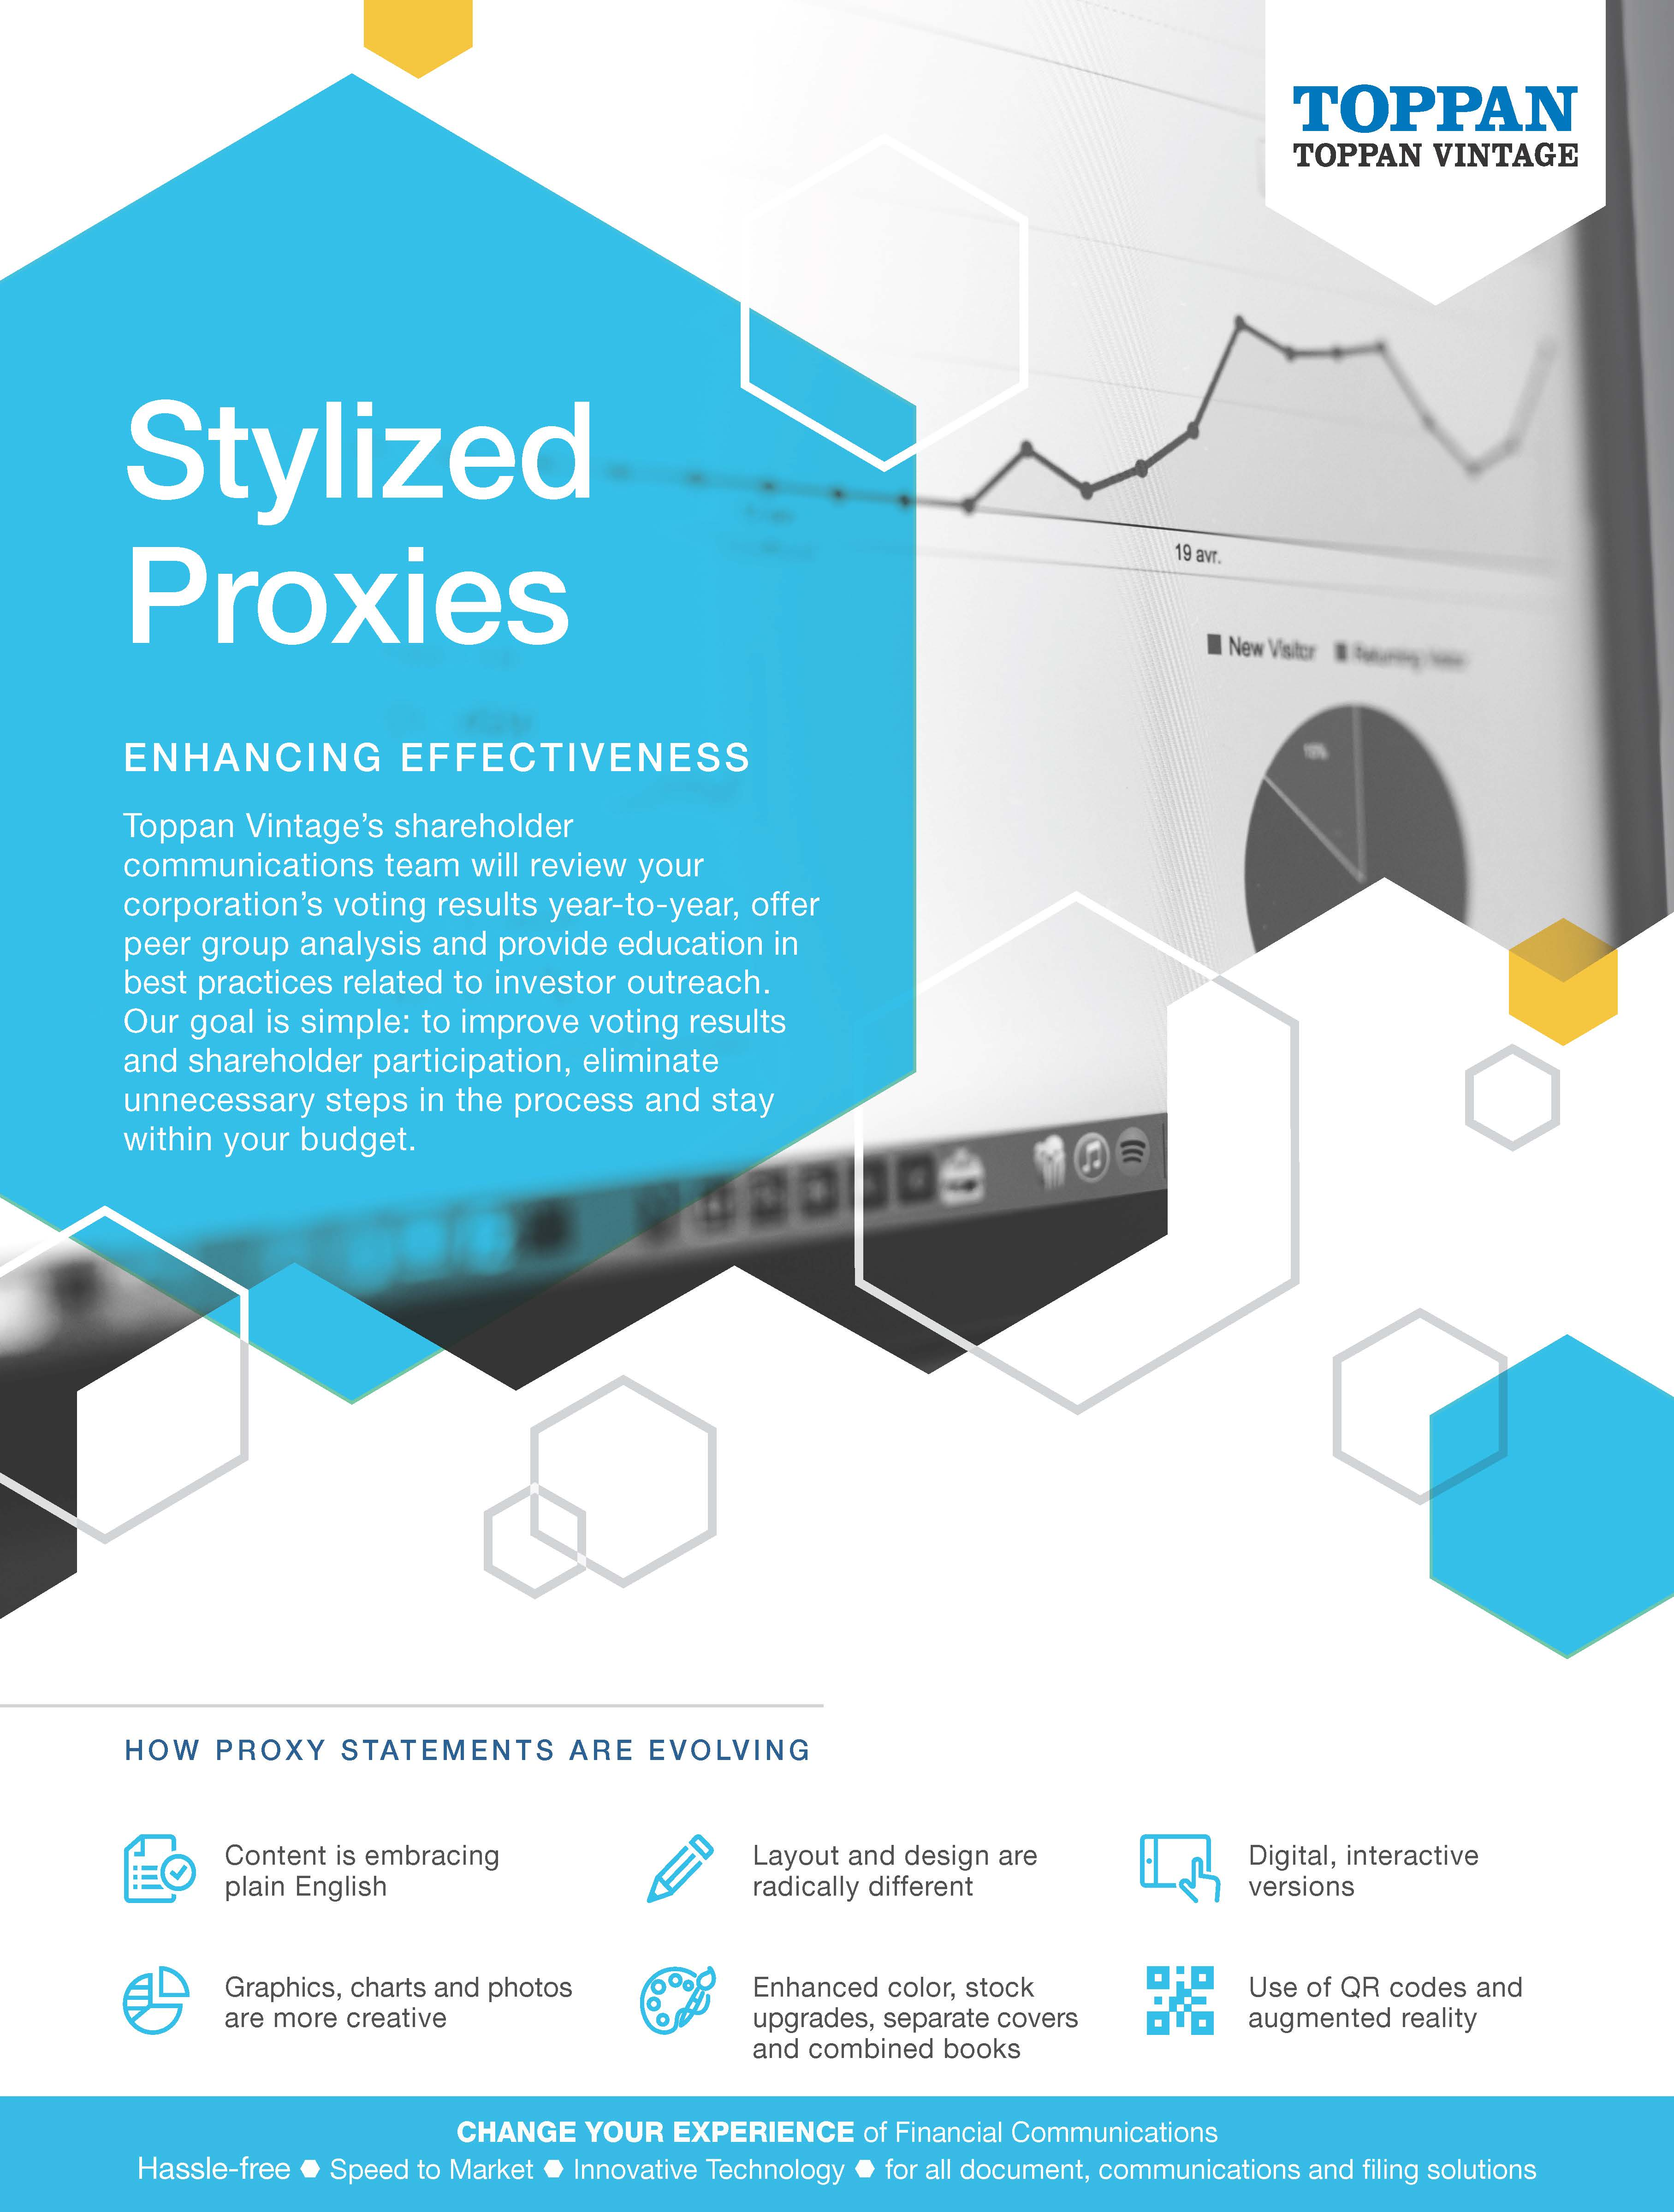 StylizedProxies_TOPPANVINTAGE_final_Page_1-1.jpg